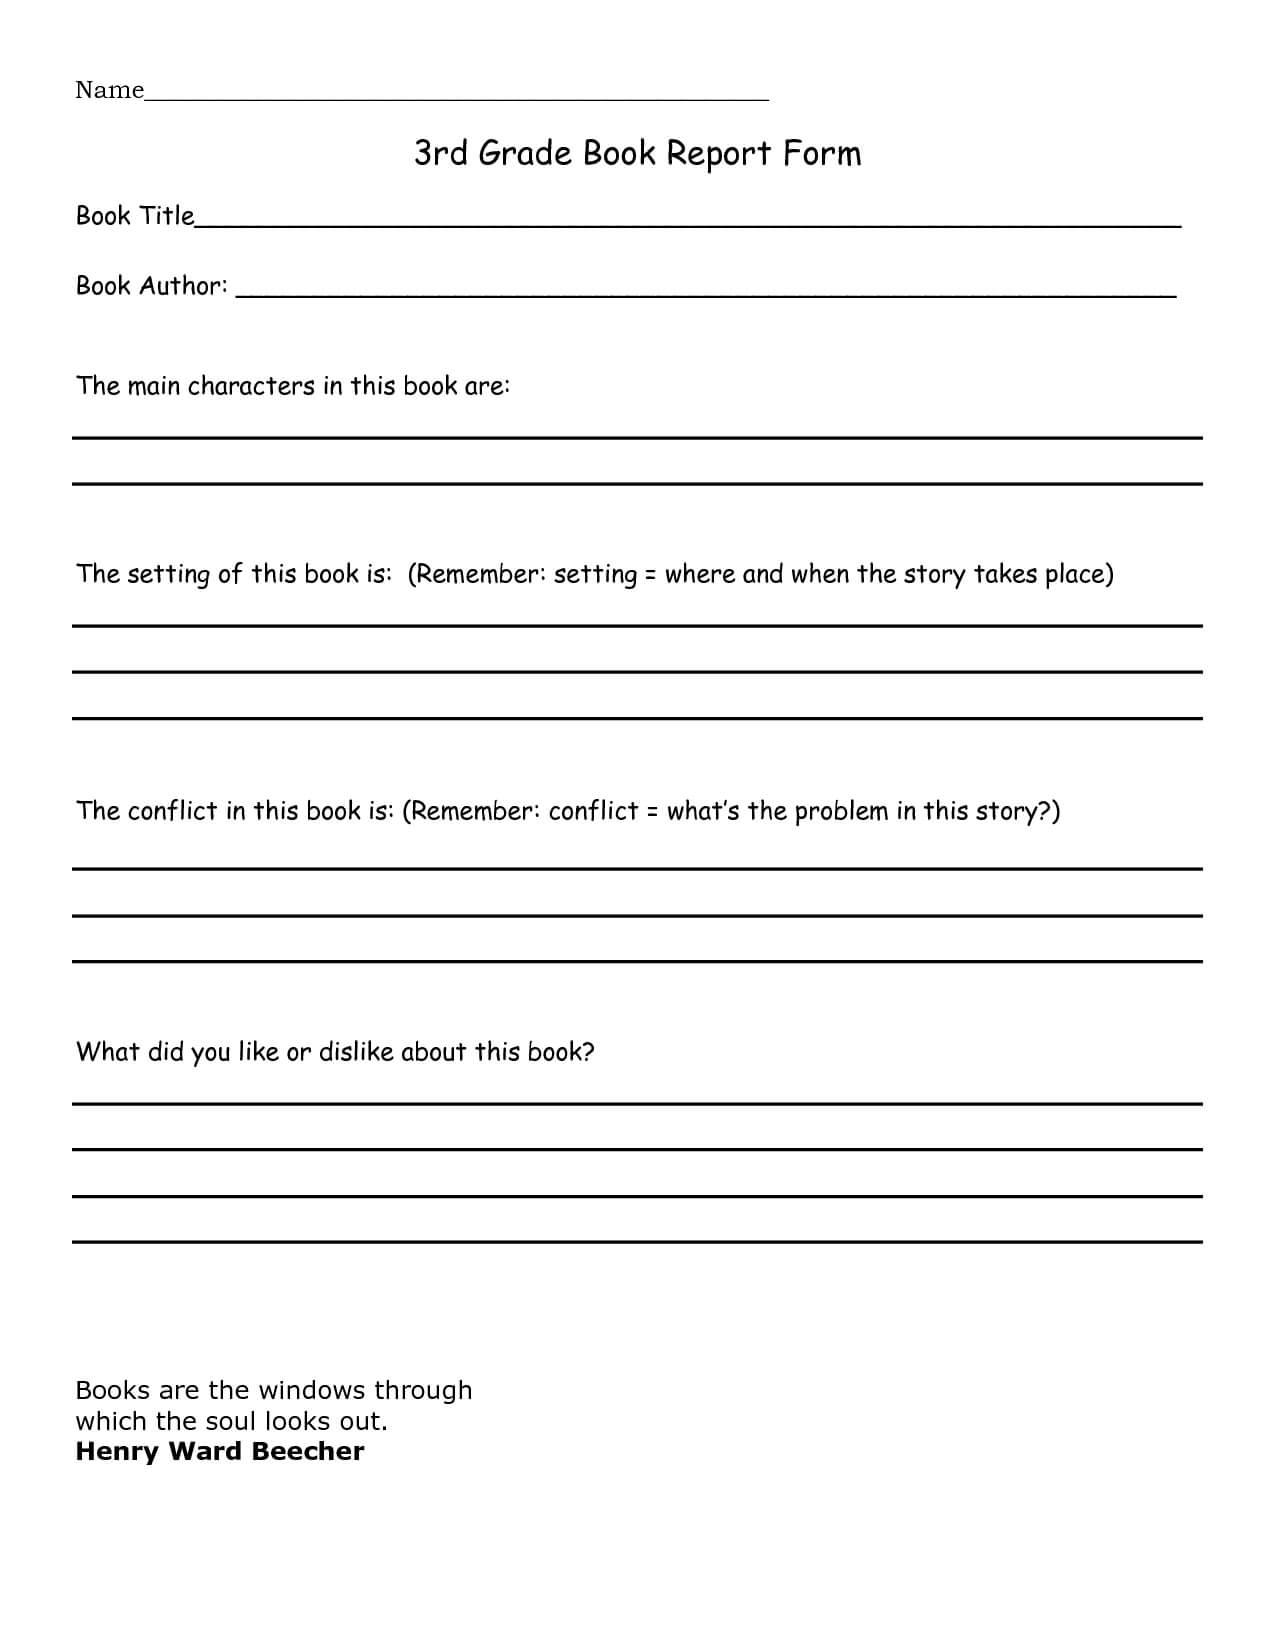 Book Report 3Rd Grade Template - Google Search | Home In Book Report Template 3Rd Grade